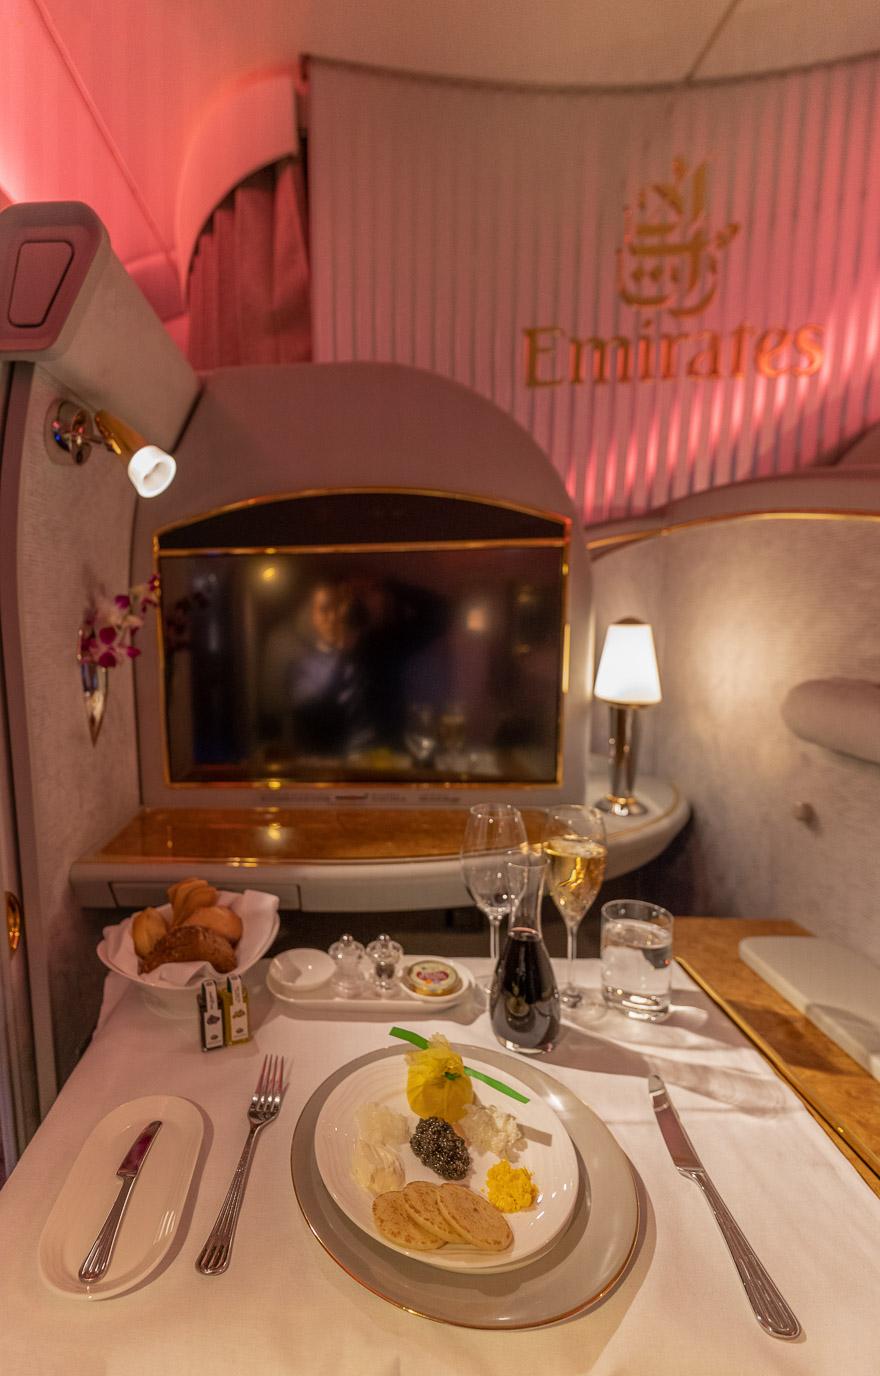 EK A380 F LGW DXB 46 - REVIEW - Emirates : First Class - A380 - London (LGW) to Dubai (DXB)